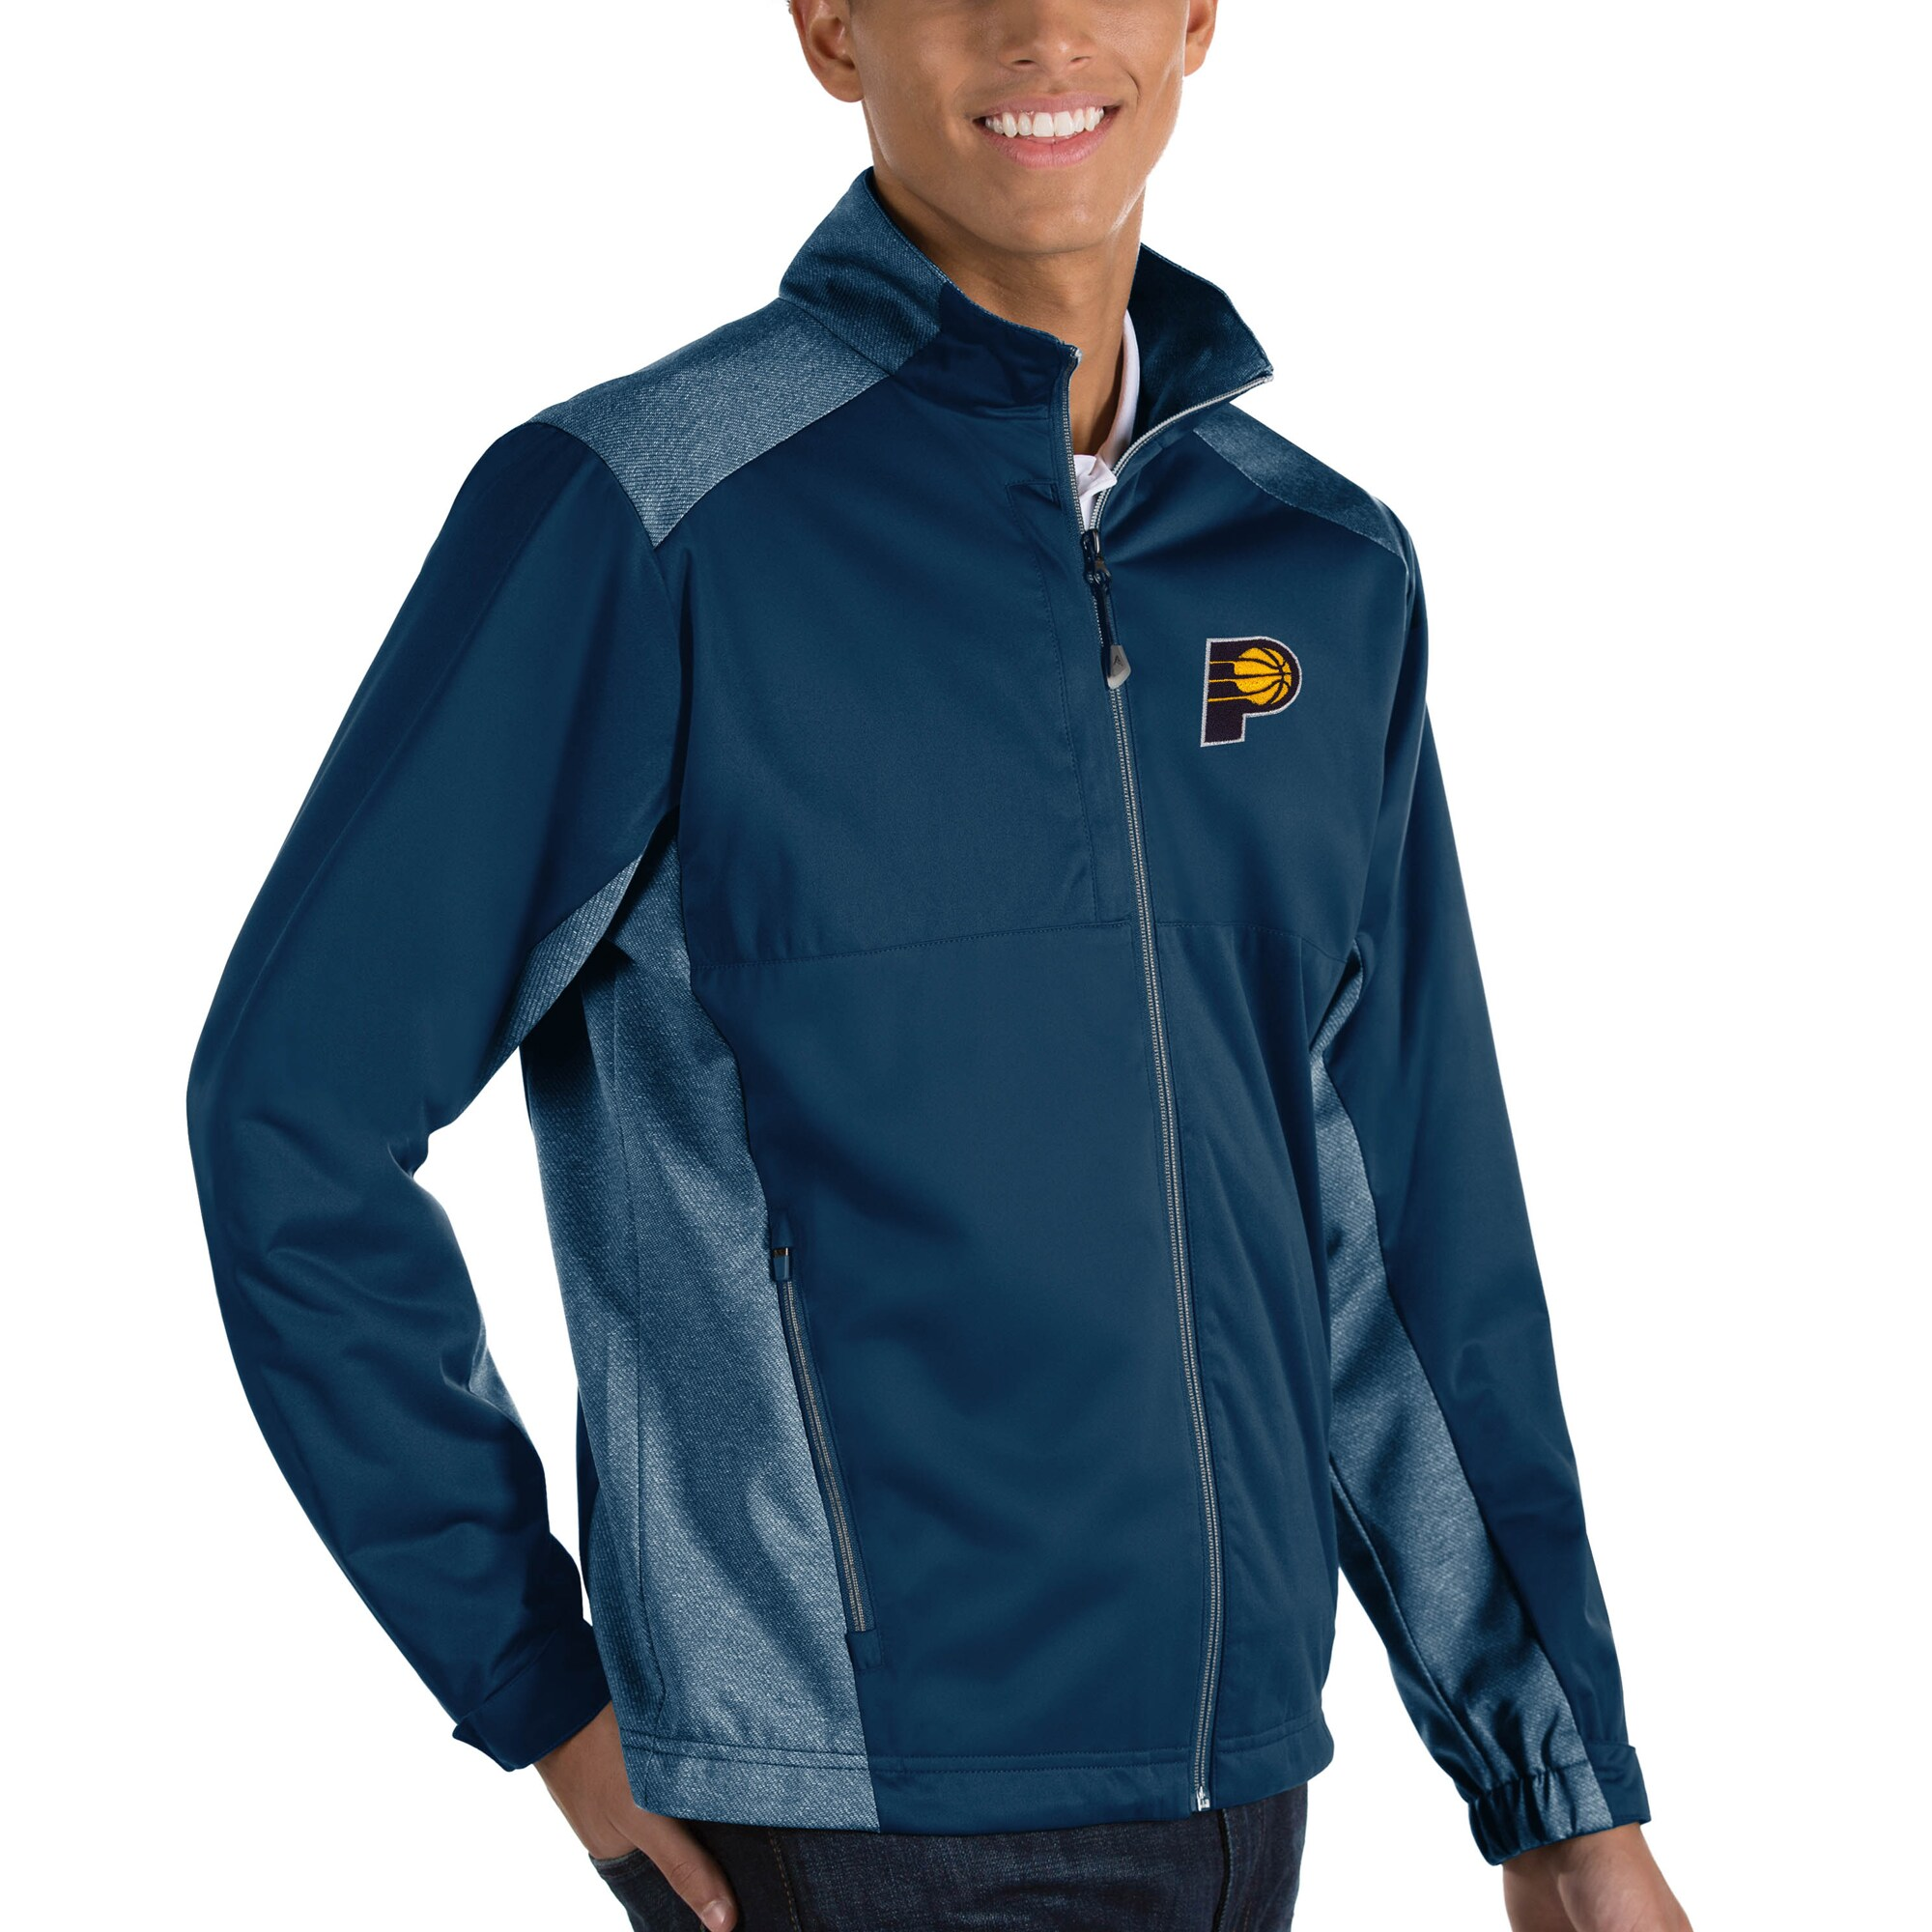 Indiana Pacers Antigua Revolve Full-Zip Jacket - Navy